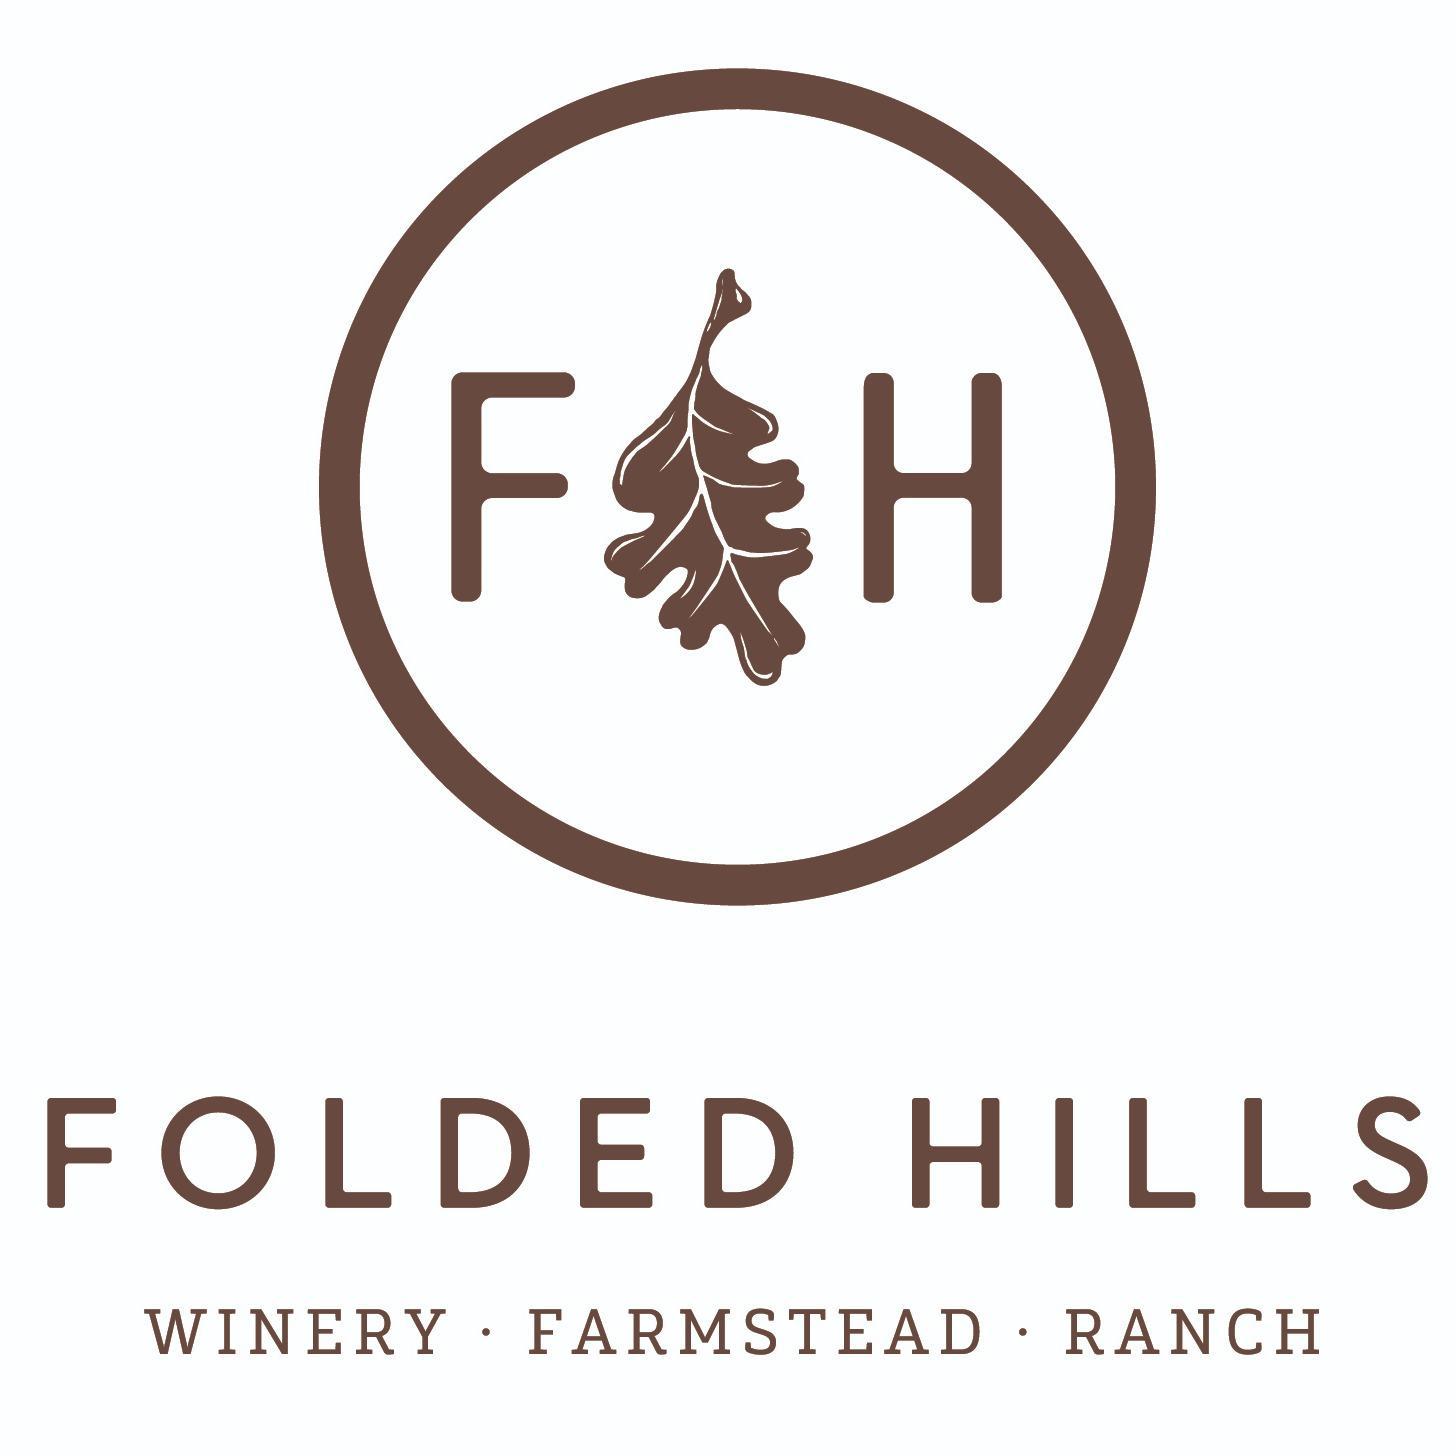 Folded Hills - Winery Ranch Farmstead